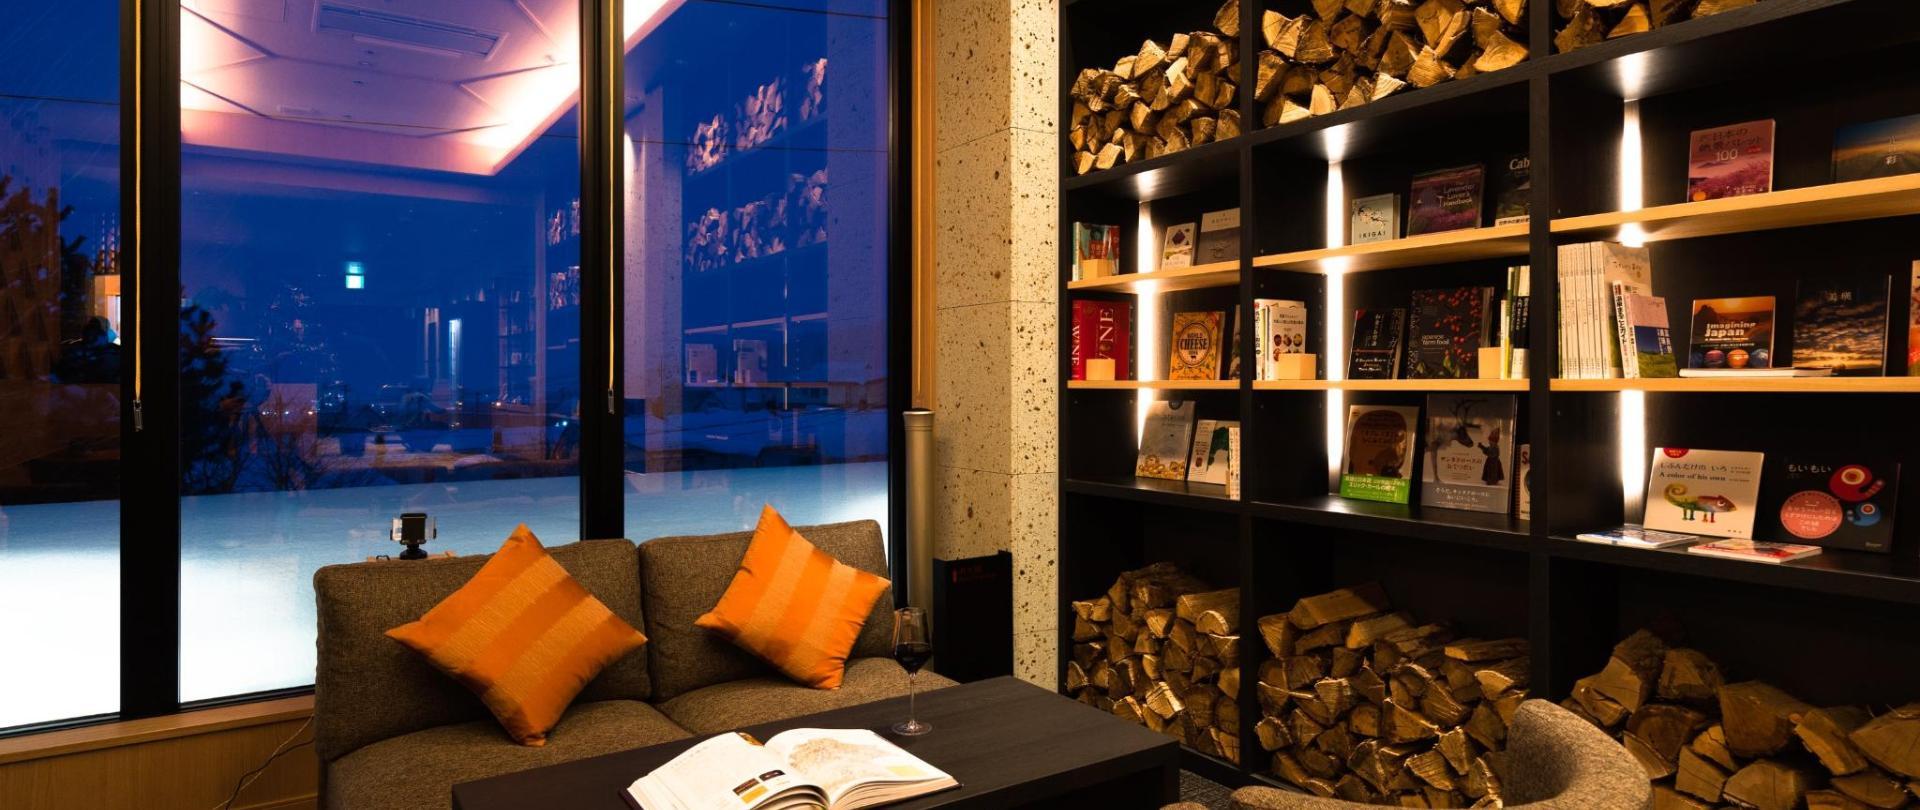 lounge_night_0654-Edit_3k.jpg